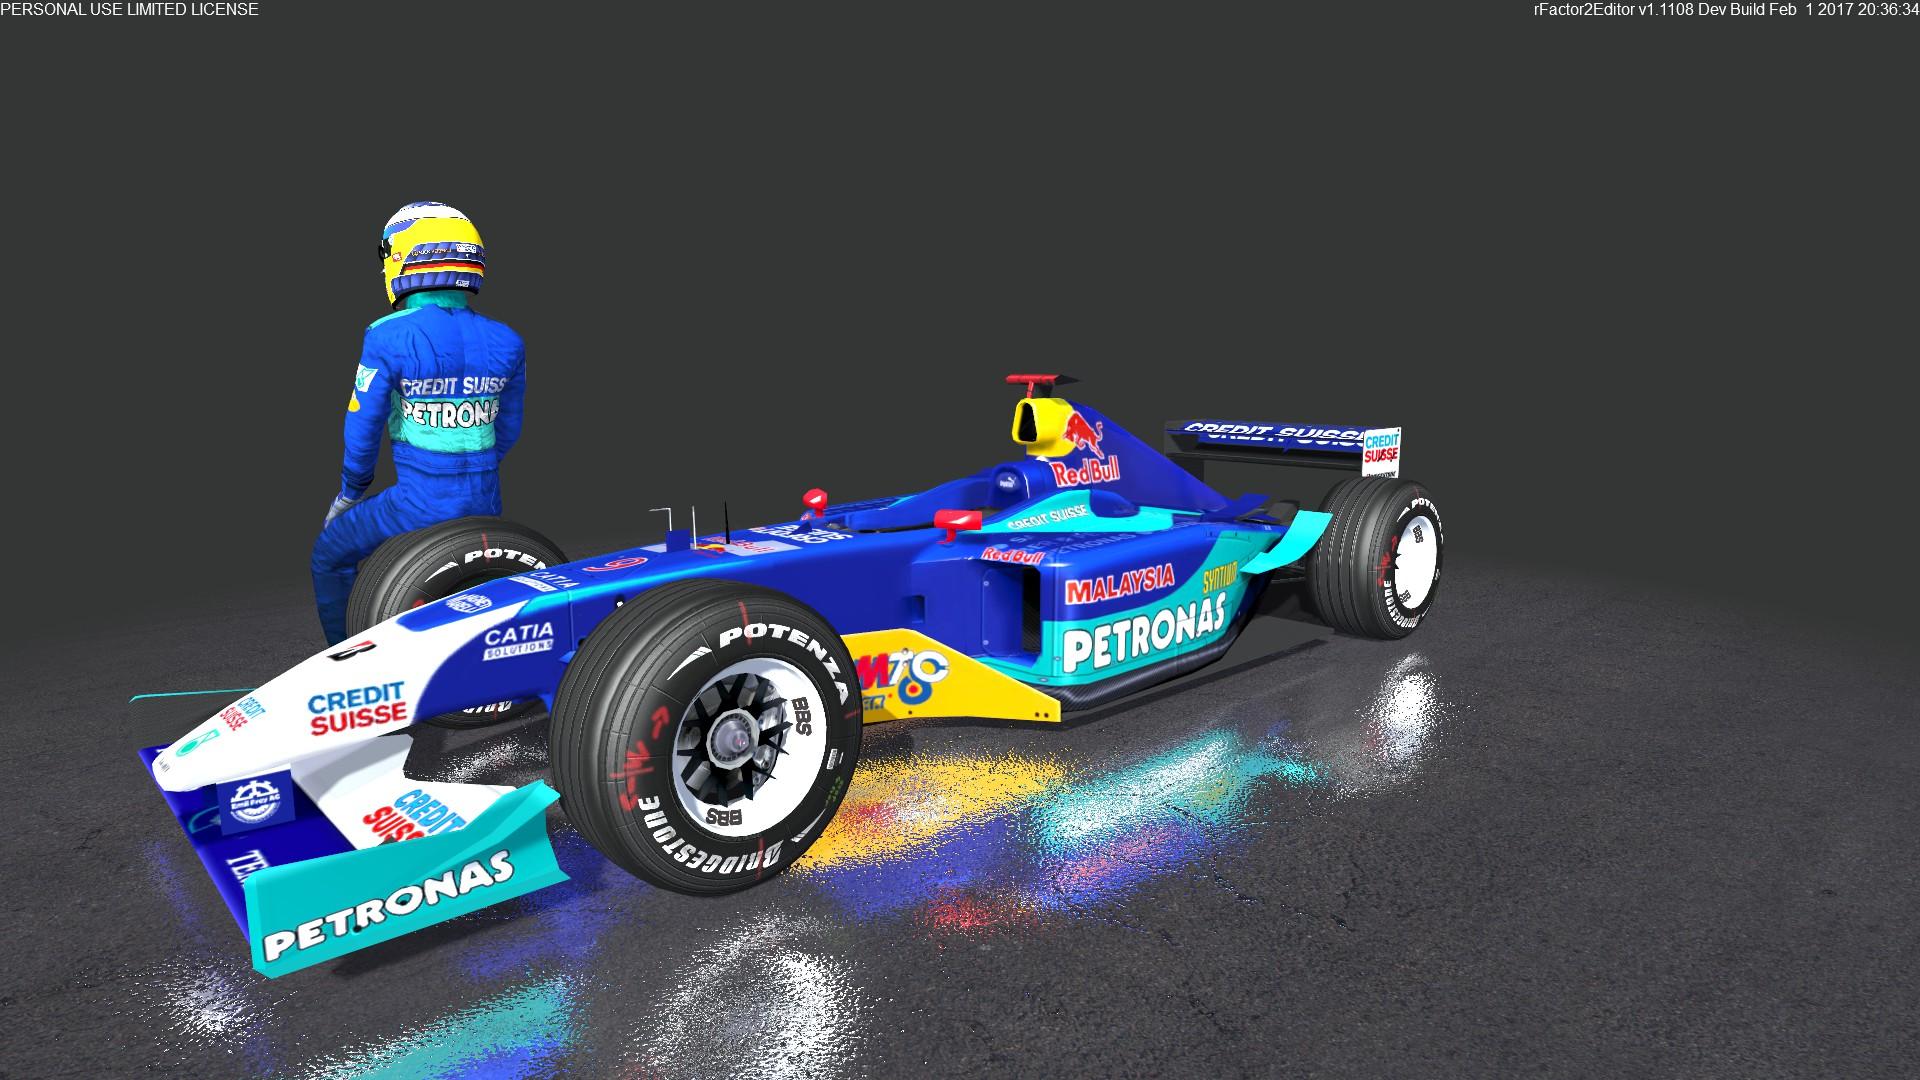 REL] F1 2003 Conversion - Release v1 0 |